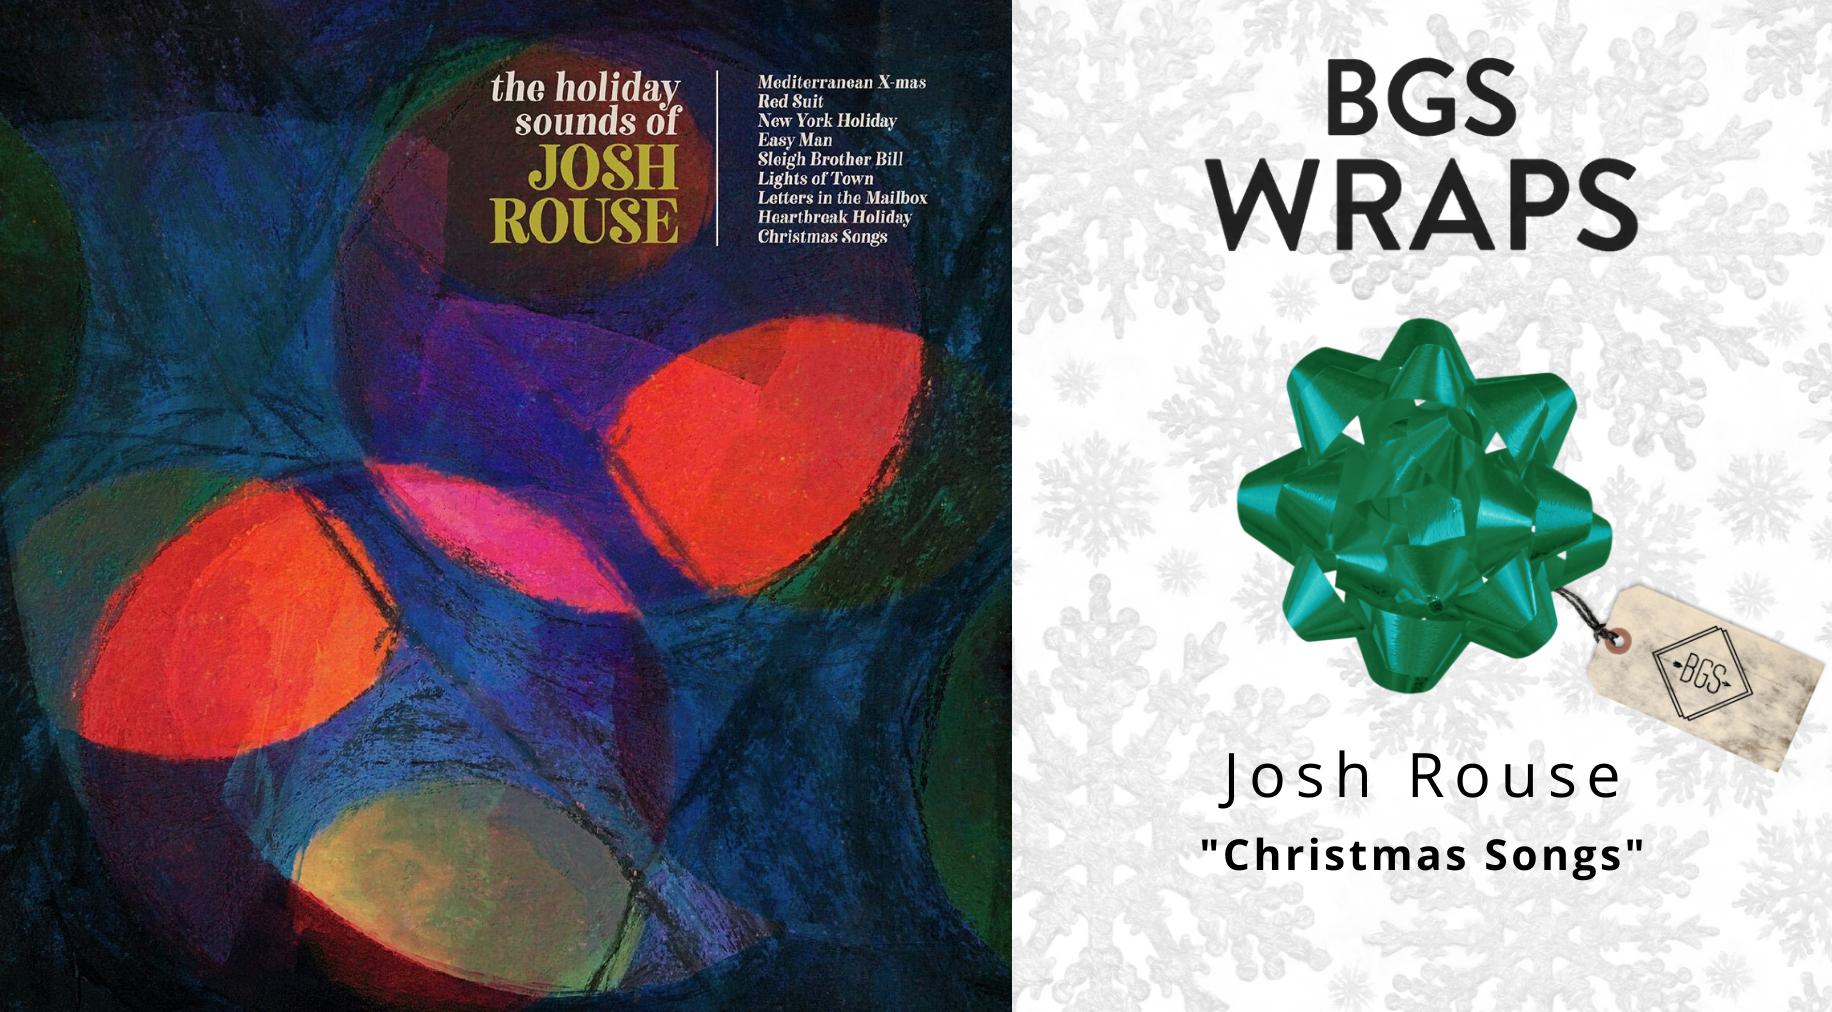 BGS WRAPS: Josh Rouse,